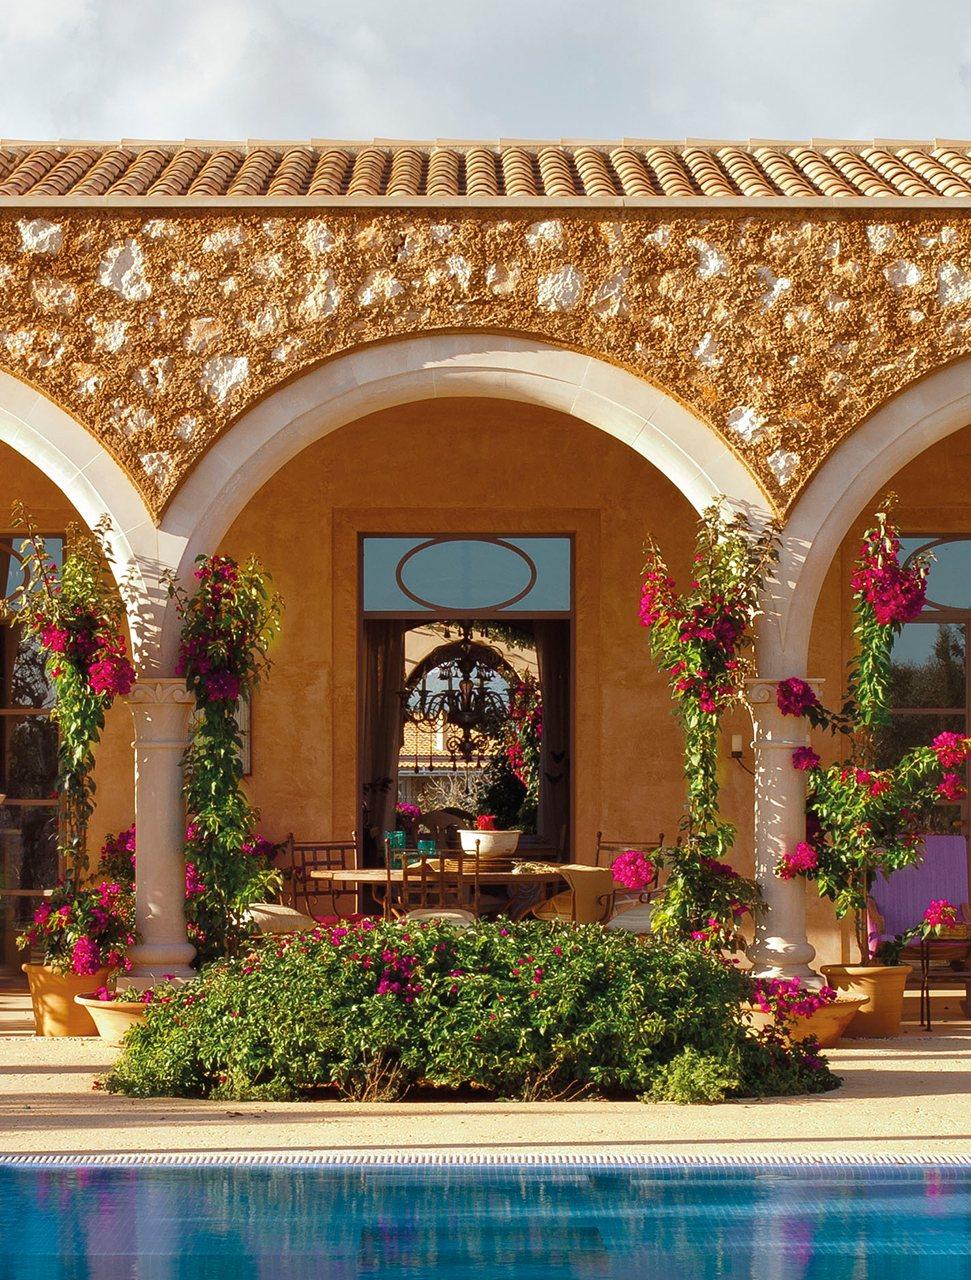 Una Casa En Mallorca Rodeada De Olivos